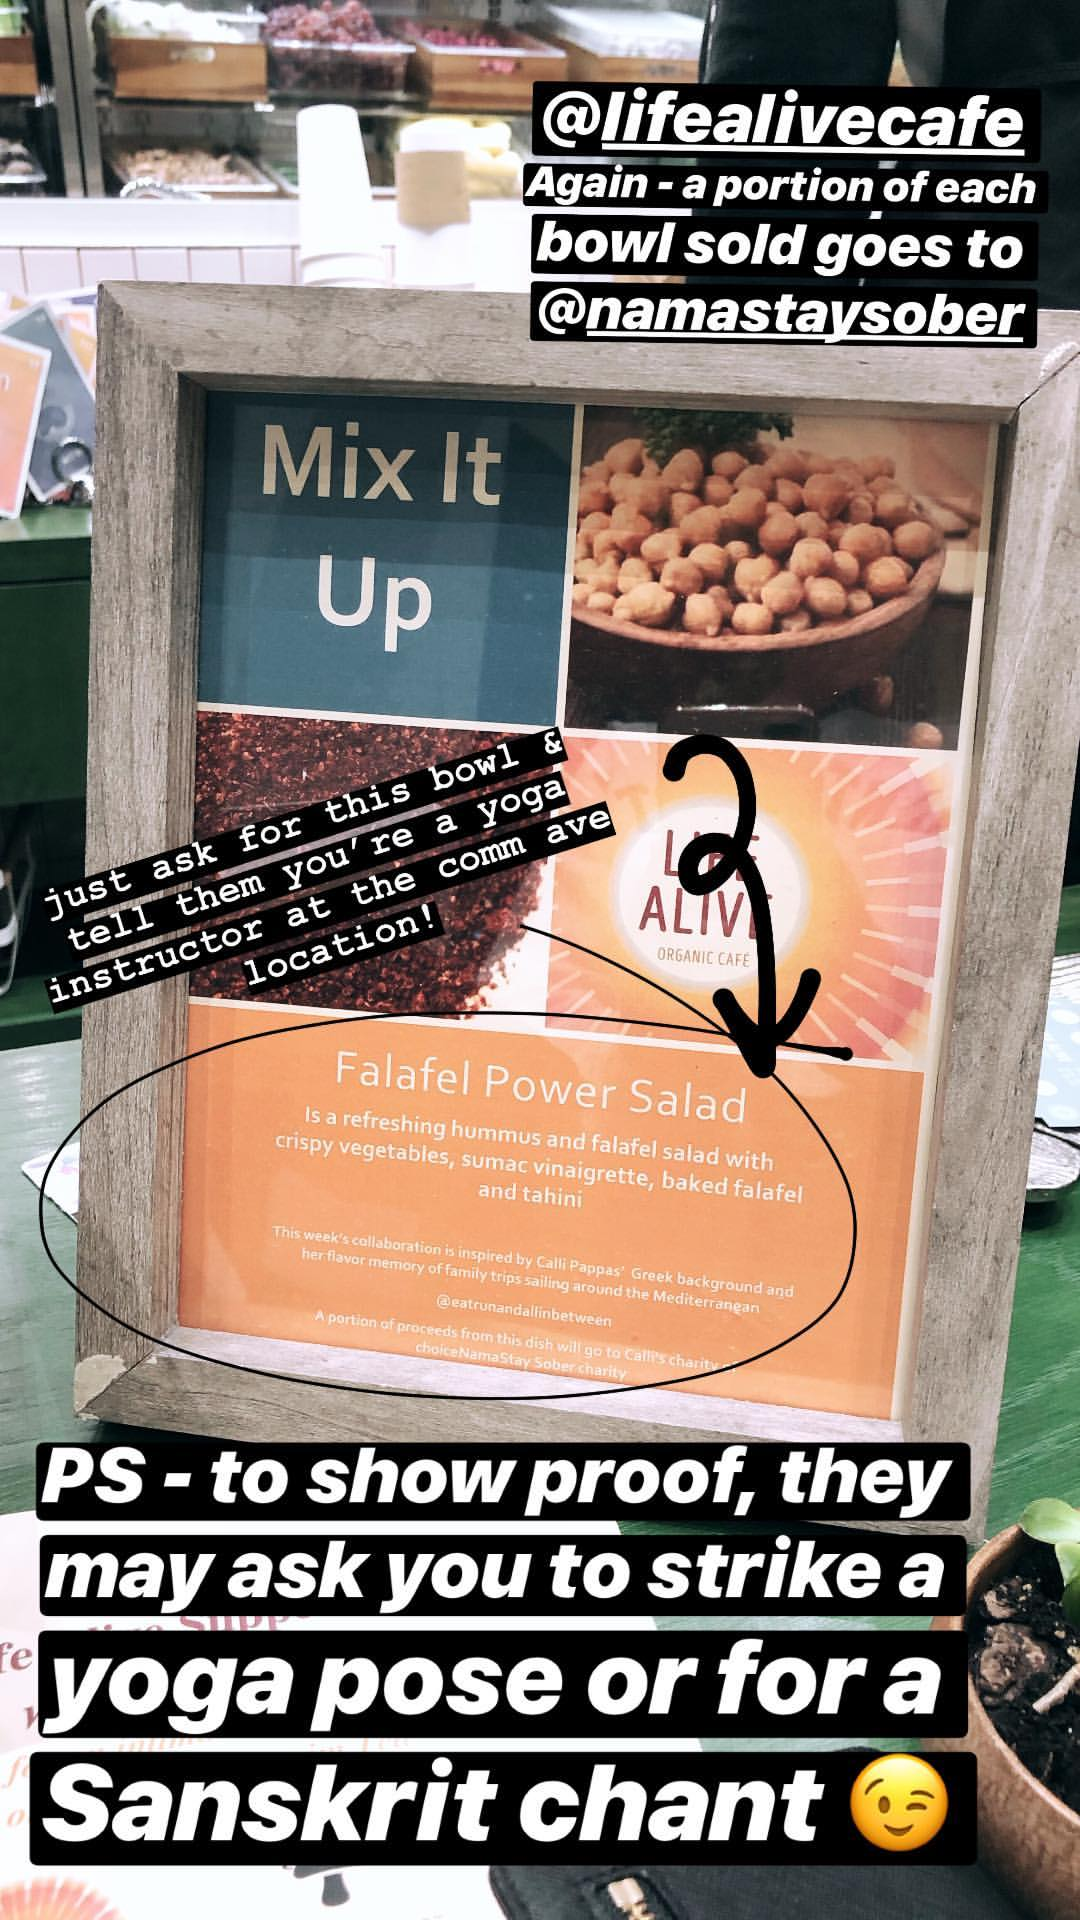 2018.12.04_eatrunandallinbetween, Instagram Story_Mix It Up_Chapter 3_Life Alive Brookline01.jpg